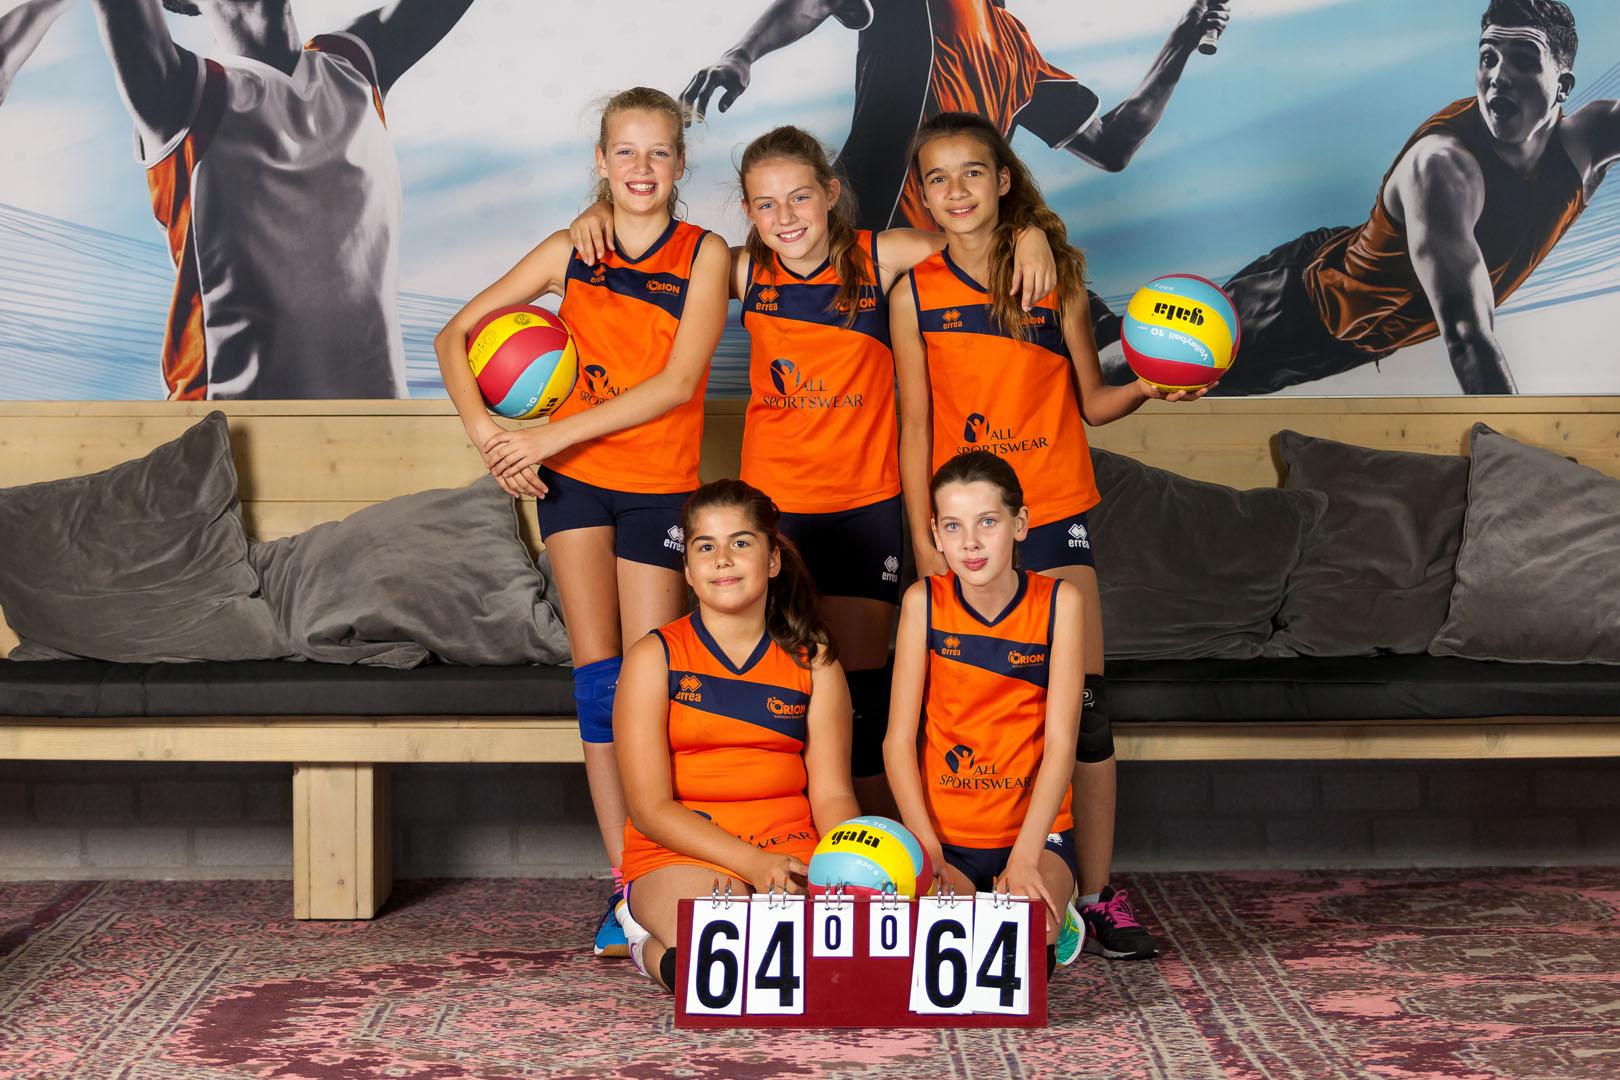 cmv-team-64